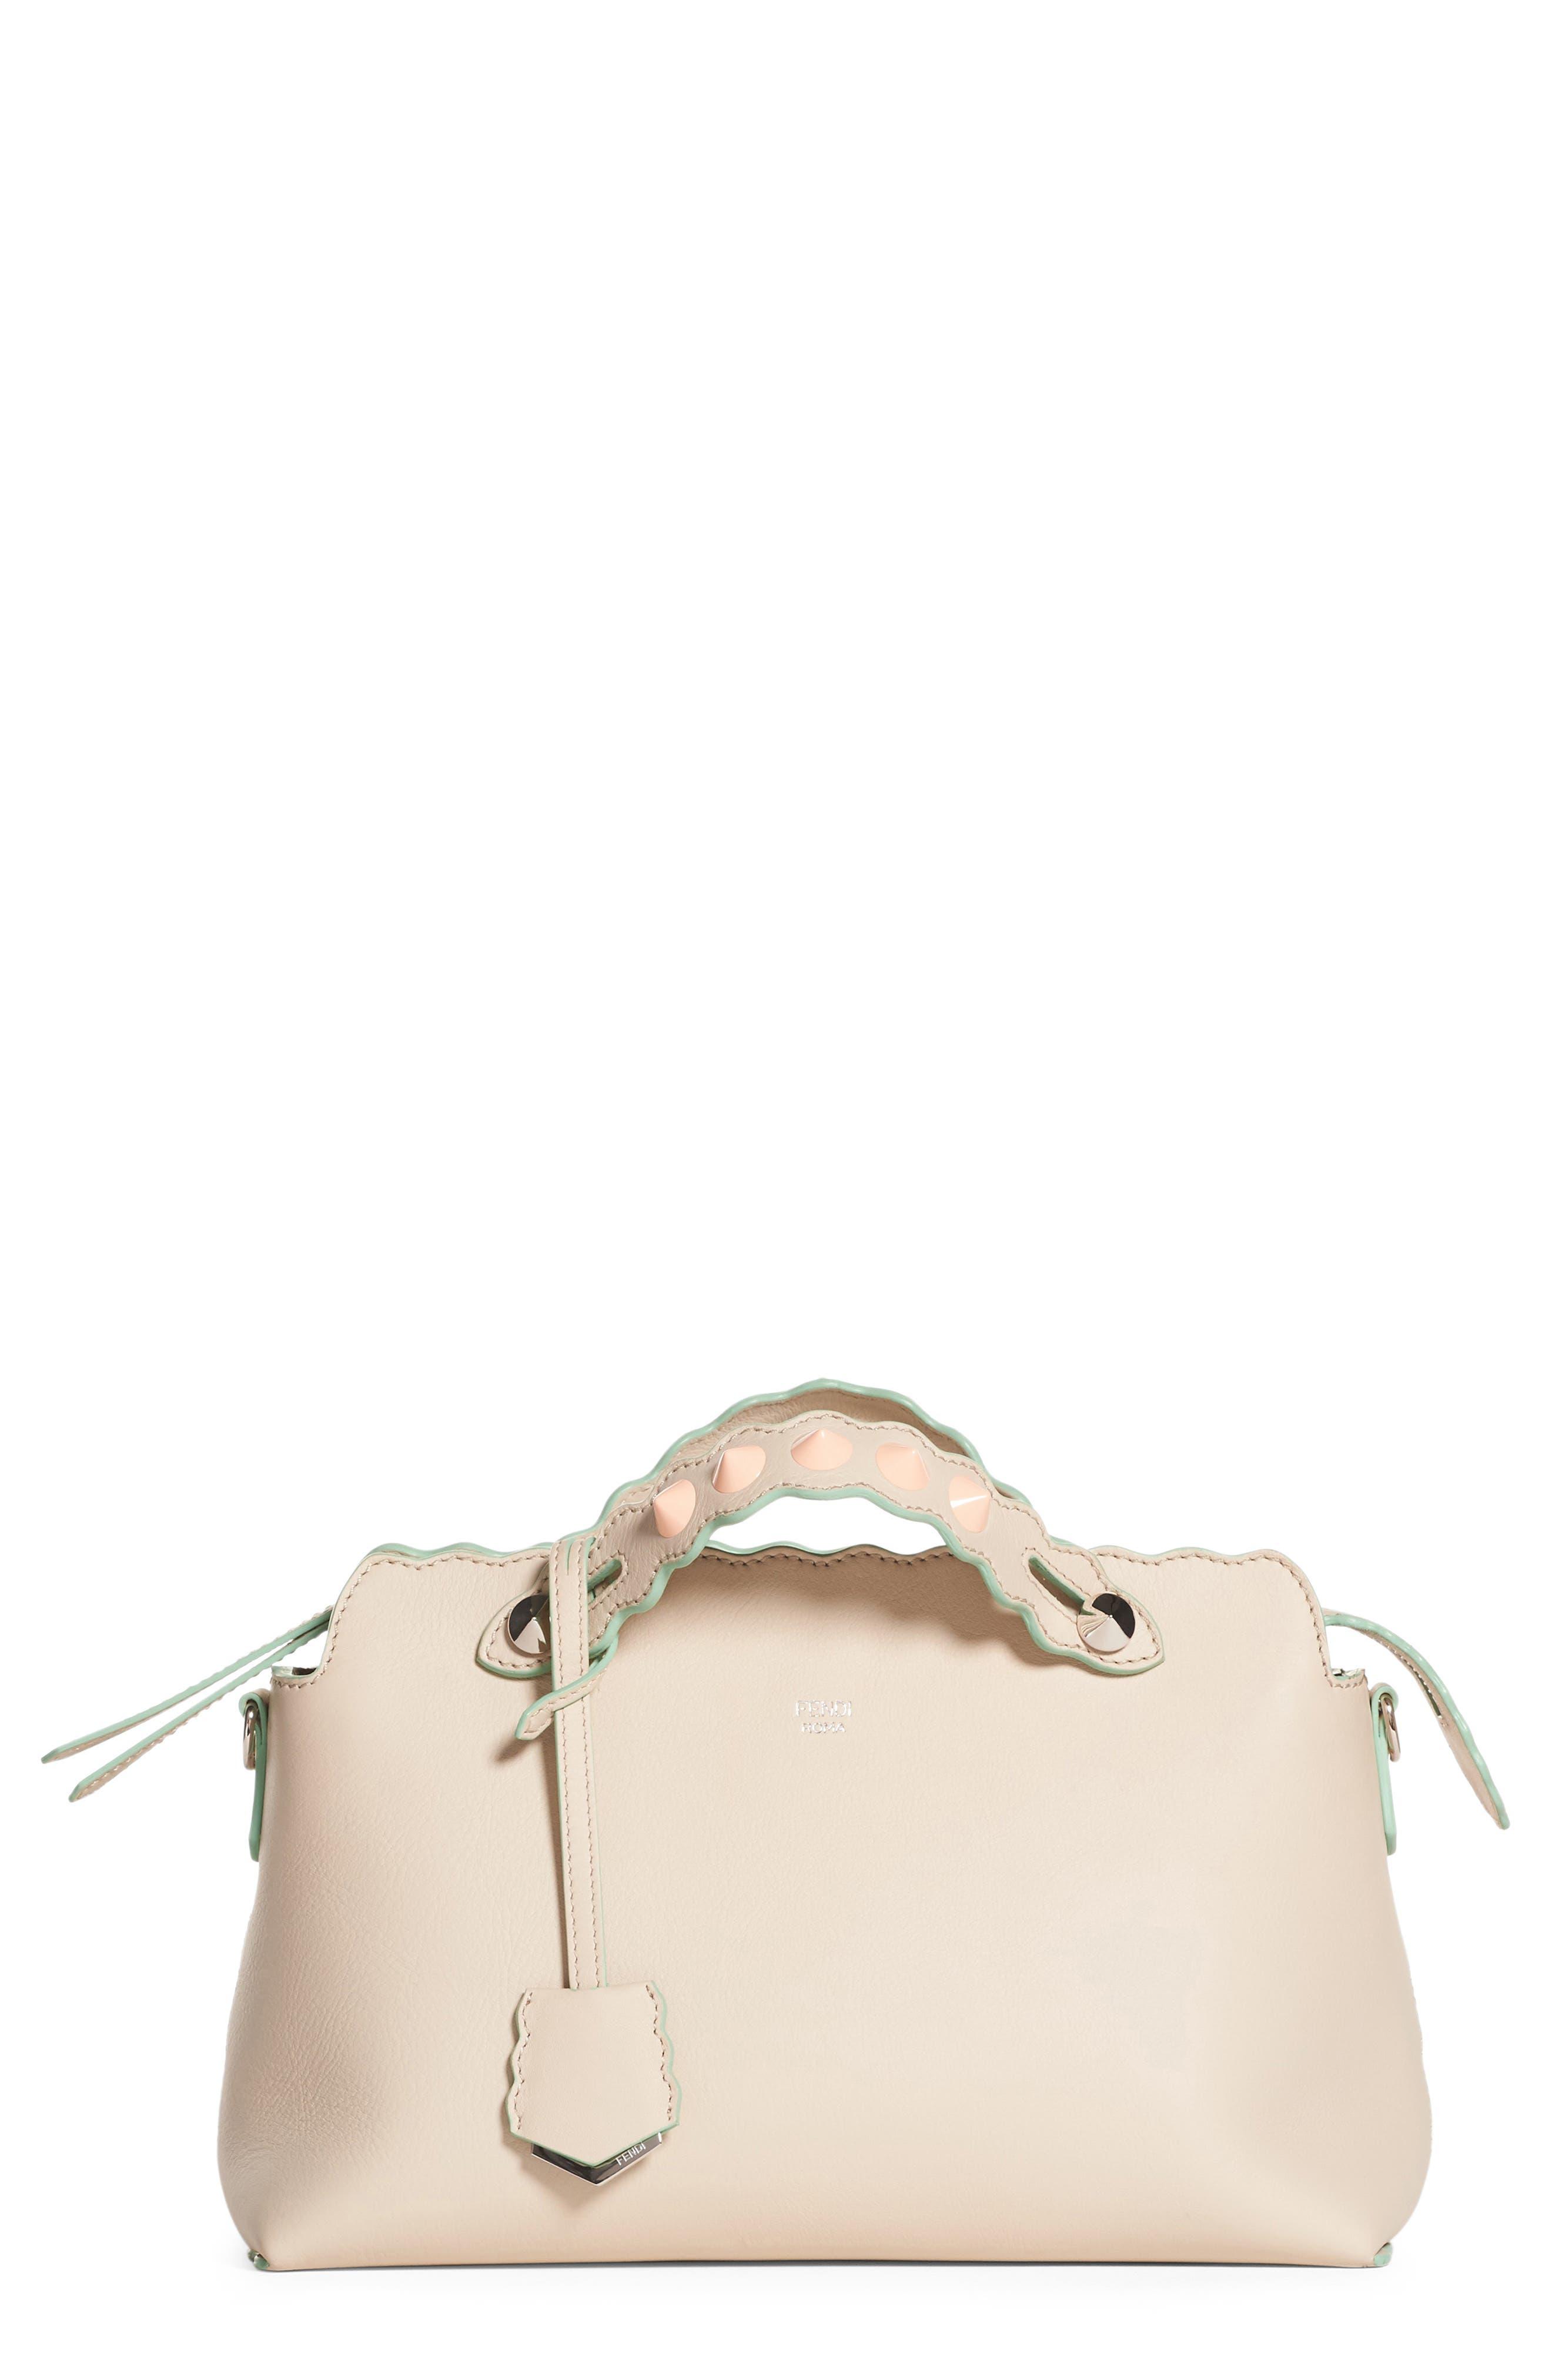 Main Image - Fendi Medium By The Way Leather Shoulder Bag